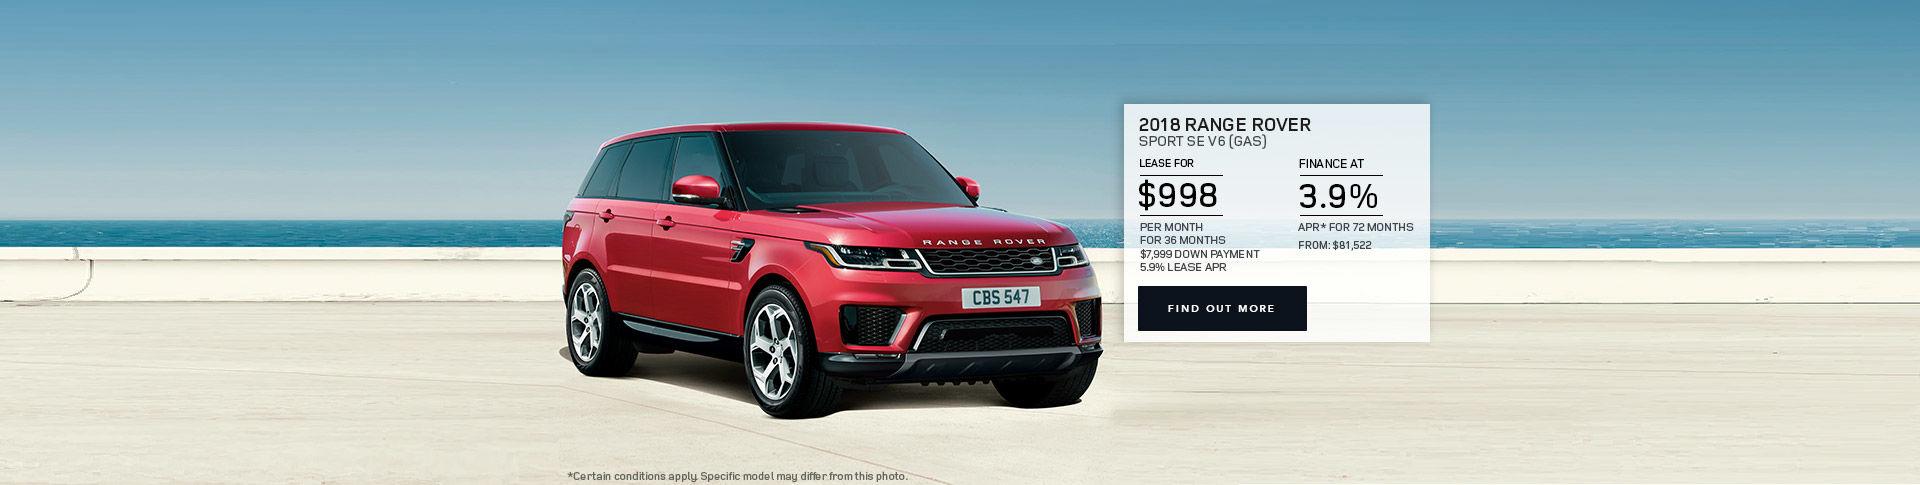 2018 Rover Sport